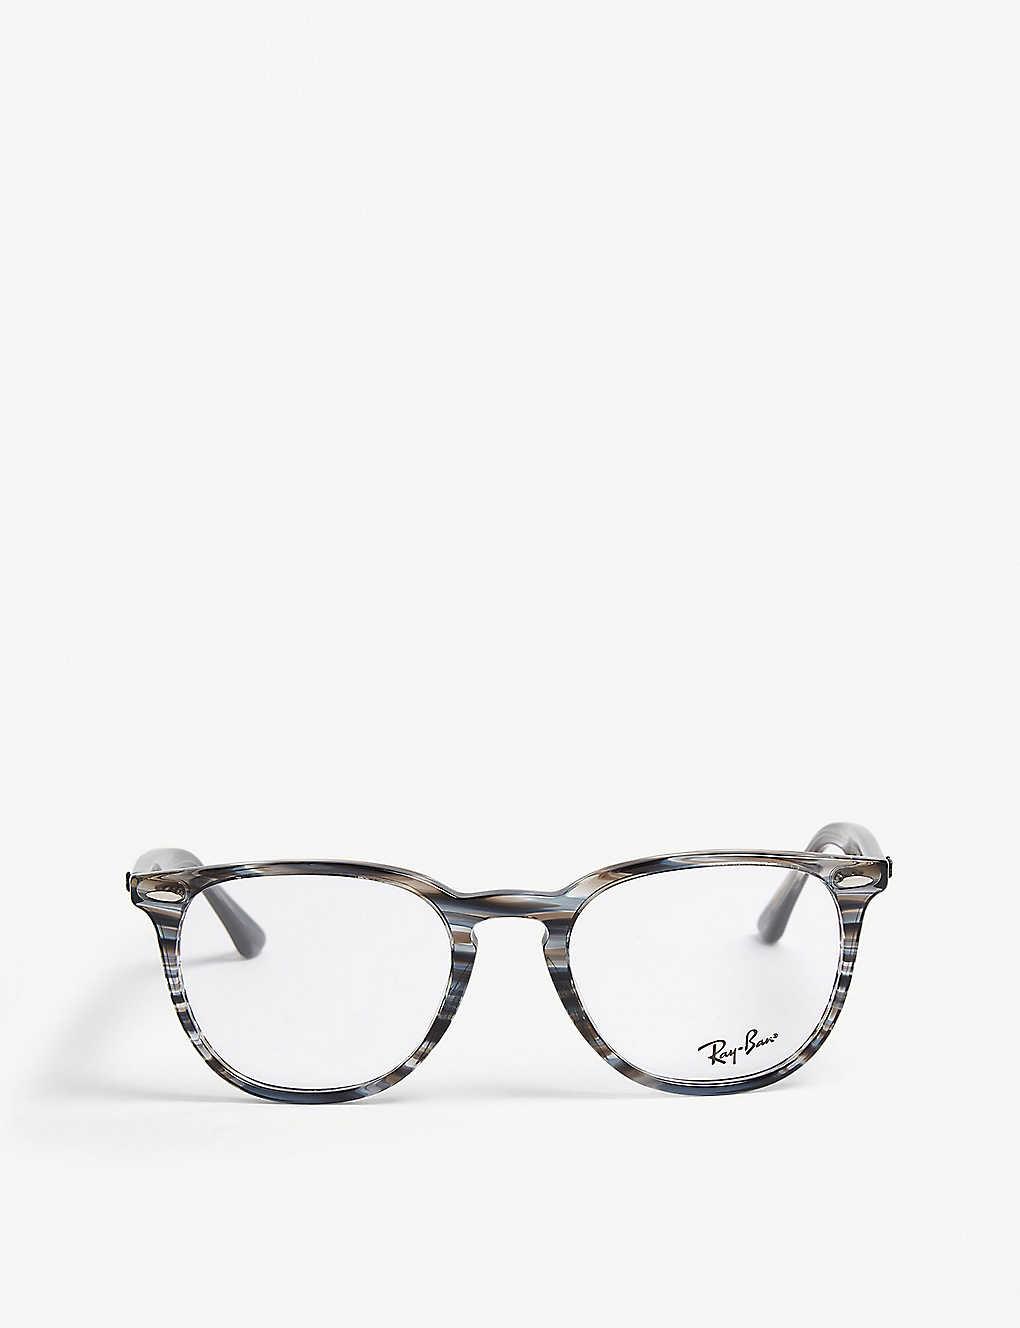 368d492d84c0 RAY-BAN - Rb7159 square-frame optical glasses | Selfridges.com